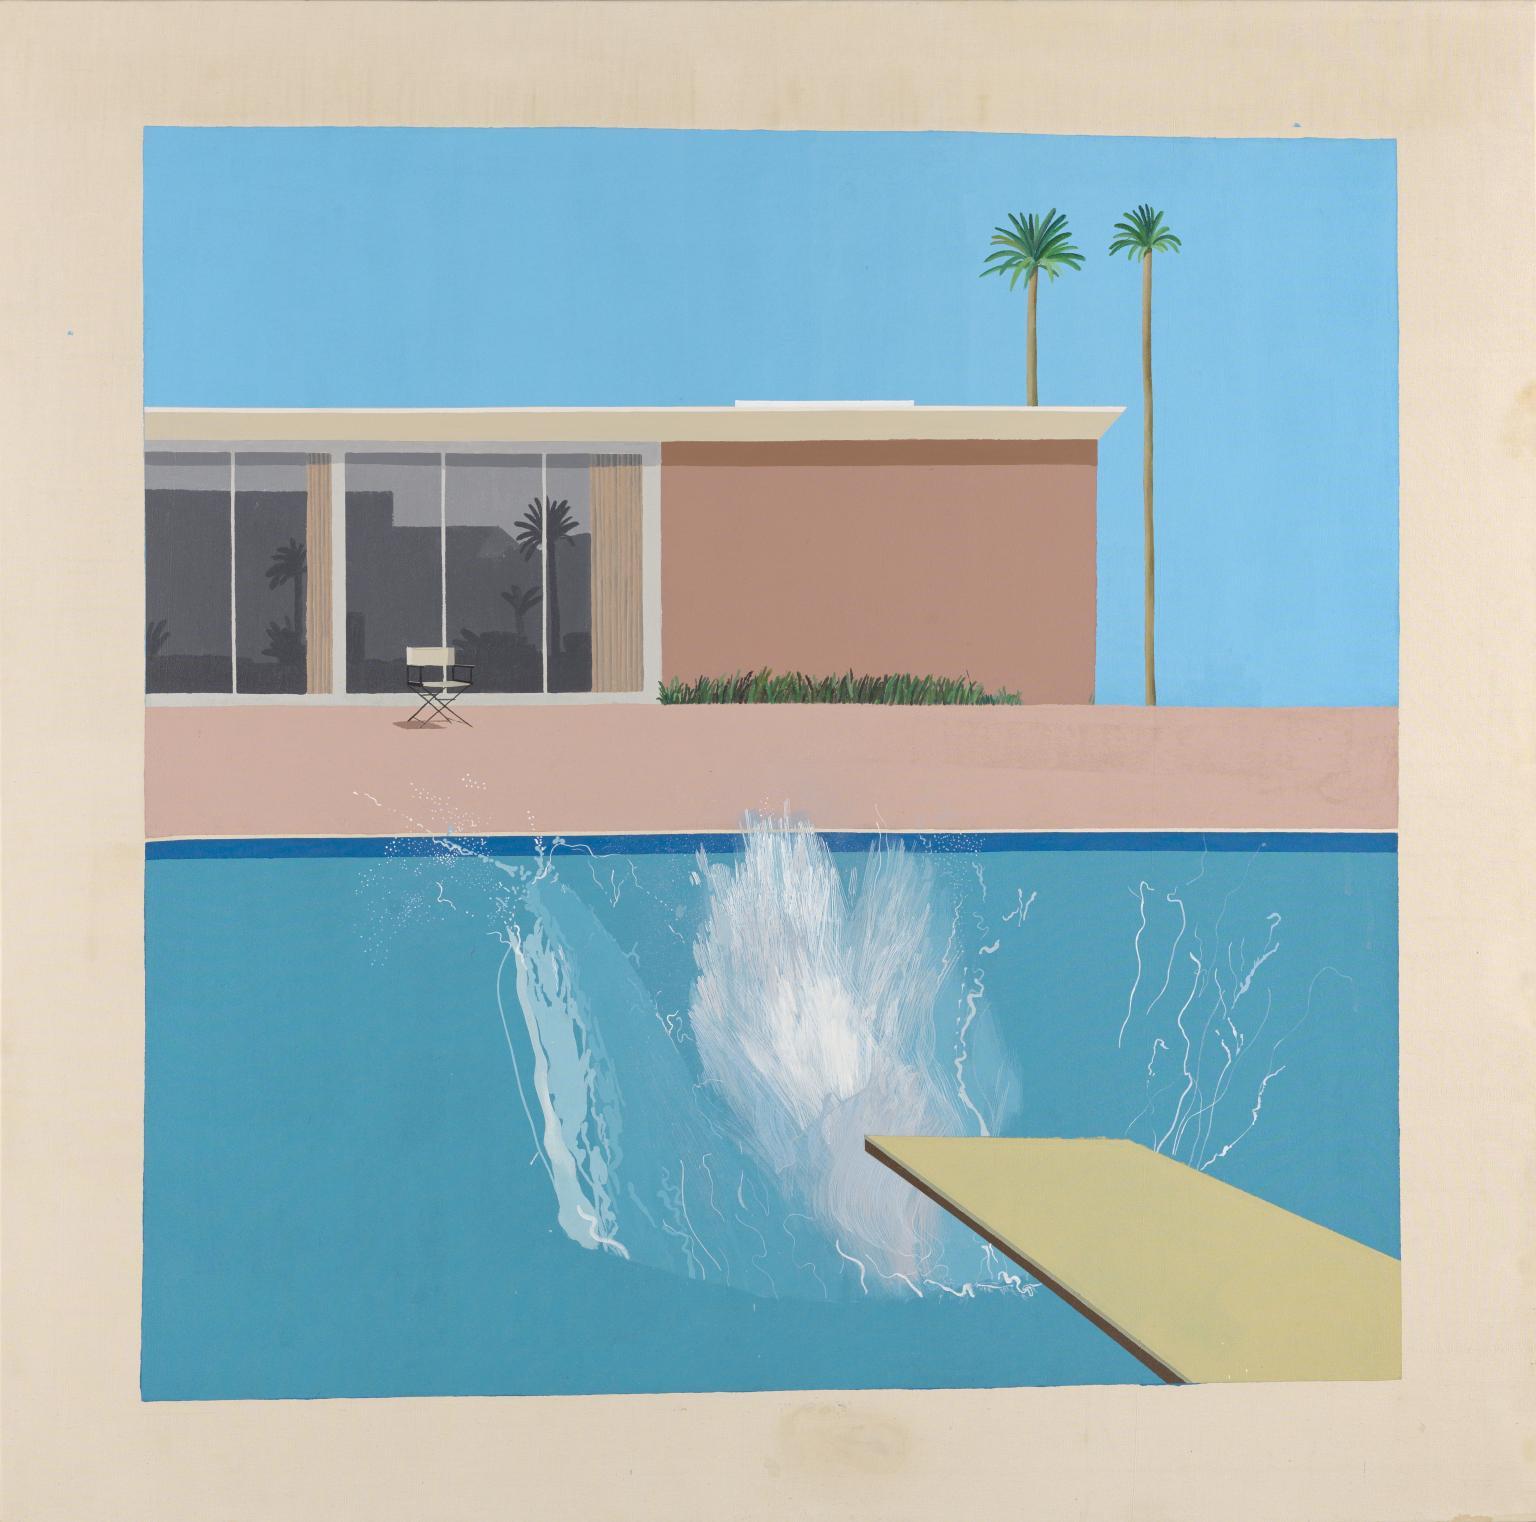 A Bigger Splash', David Hockney, 1967 | Tate